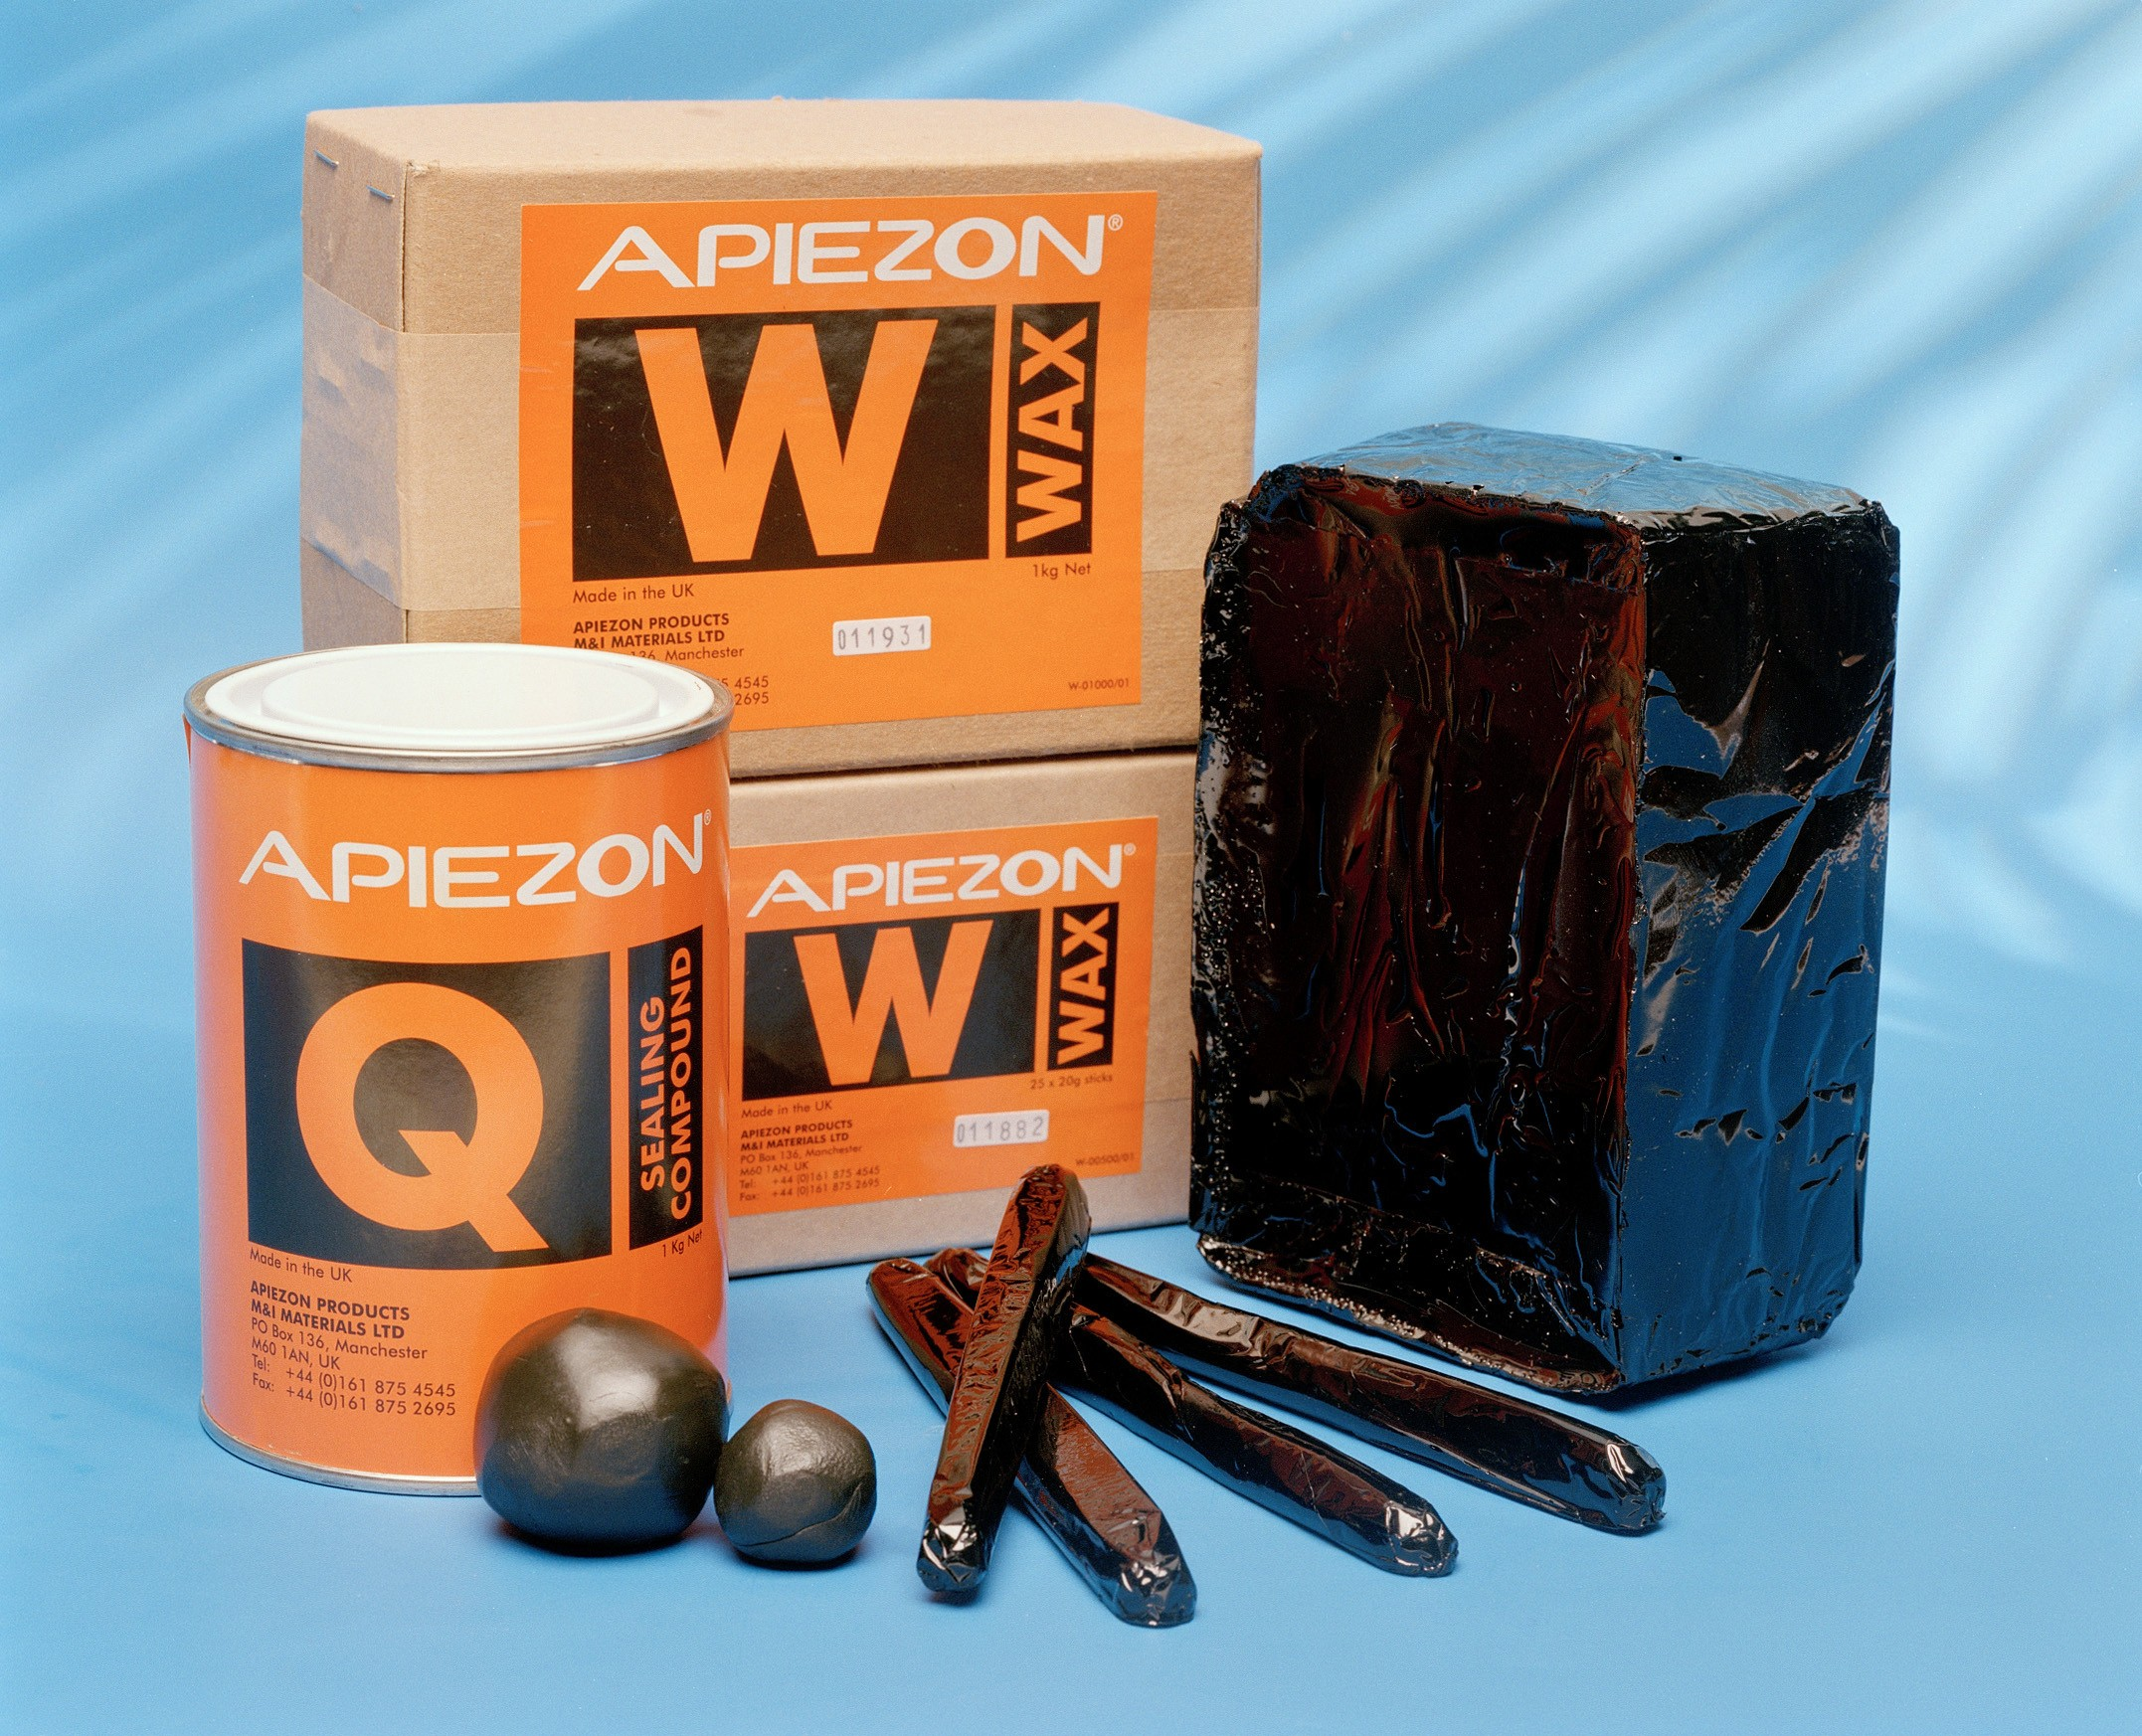 Apiezon_pack_Waxes_300dpi.jpg